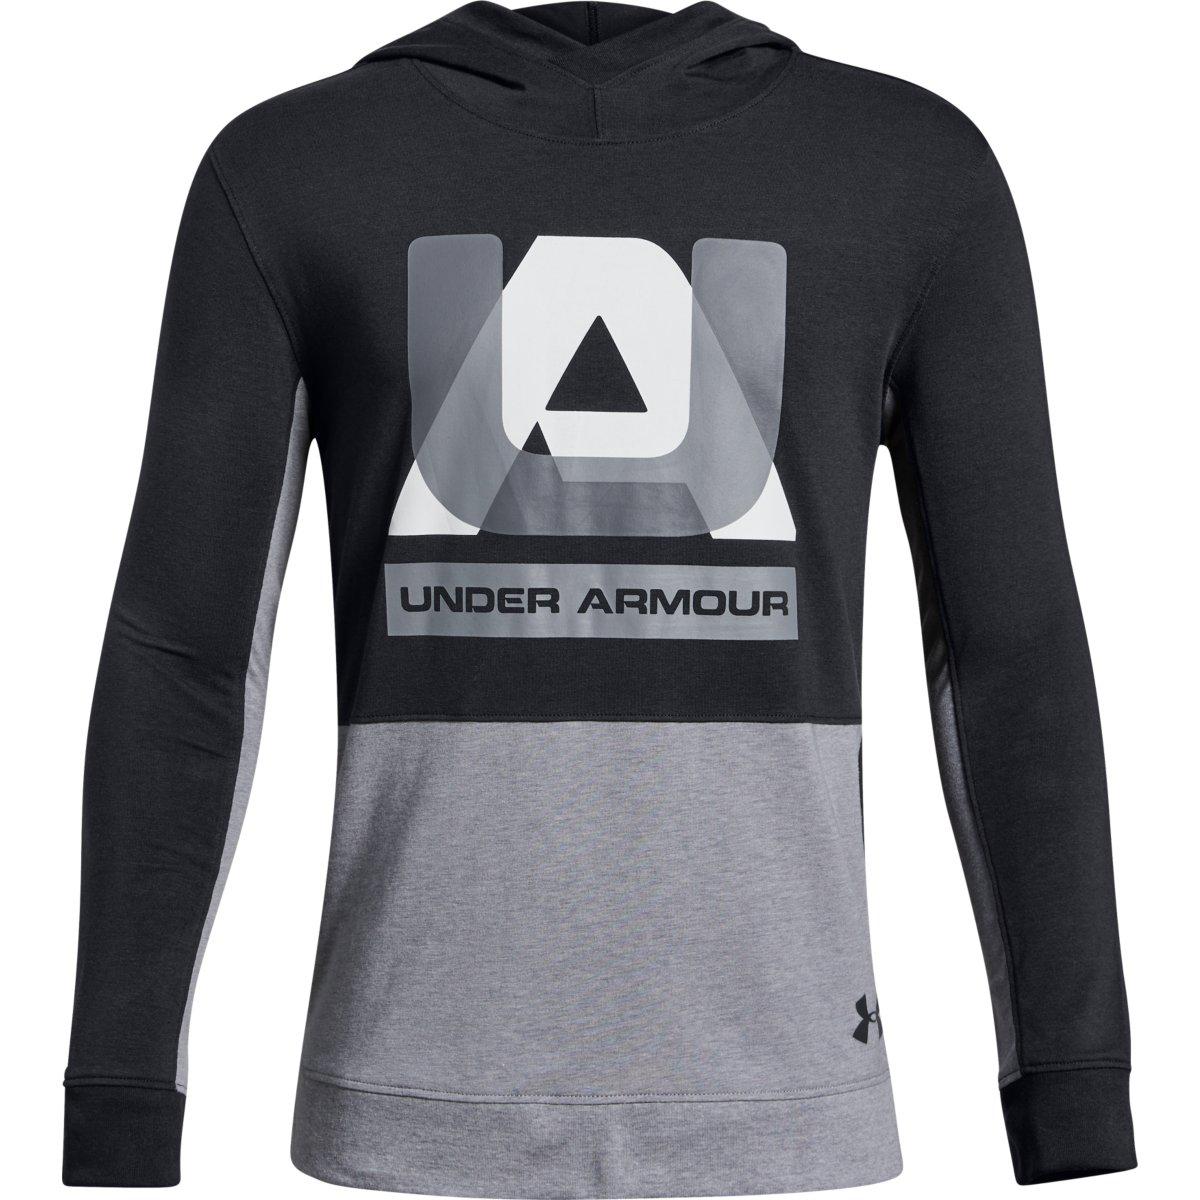 Under Armour Big Boys' Ua Sportstyle Pullover Hoodie - Black, M